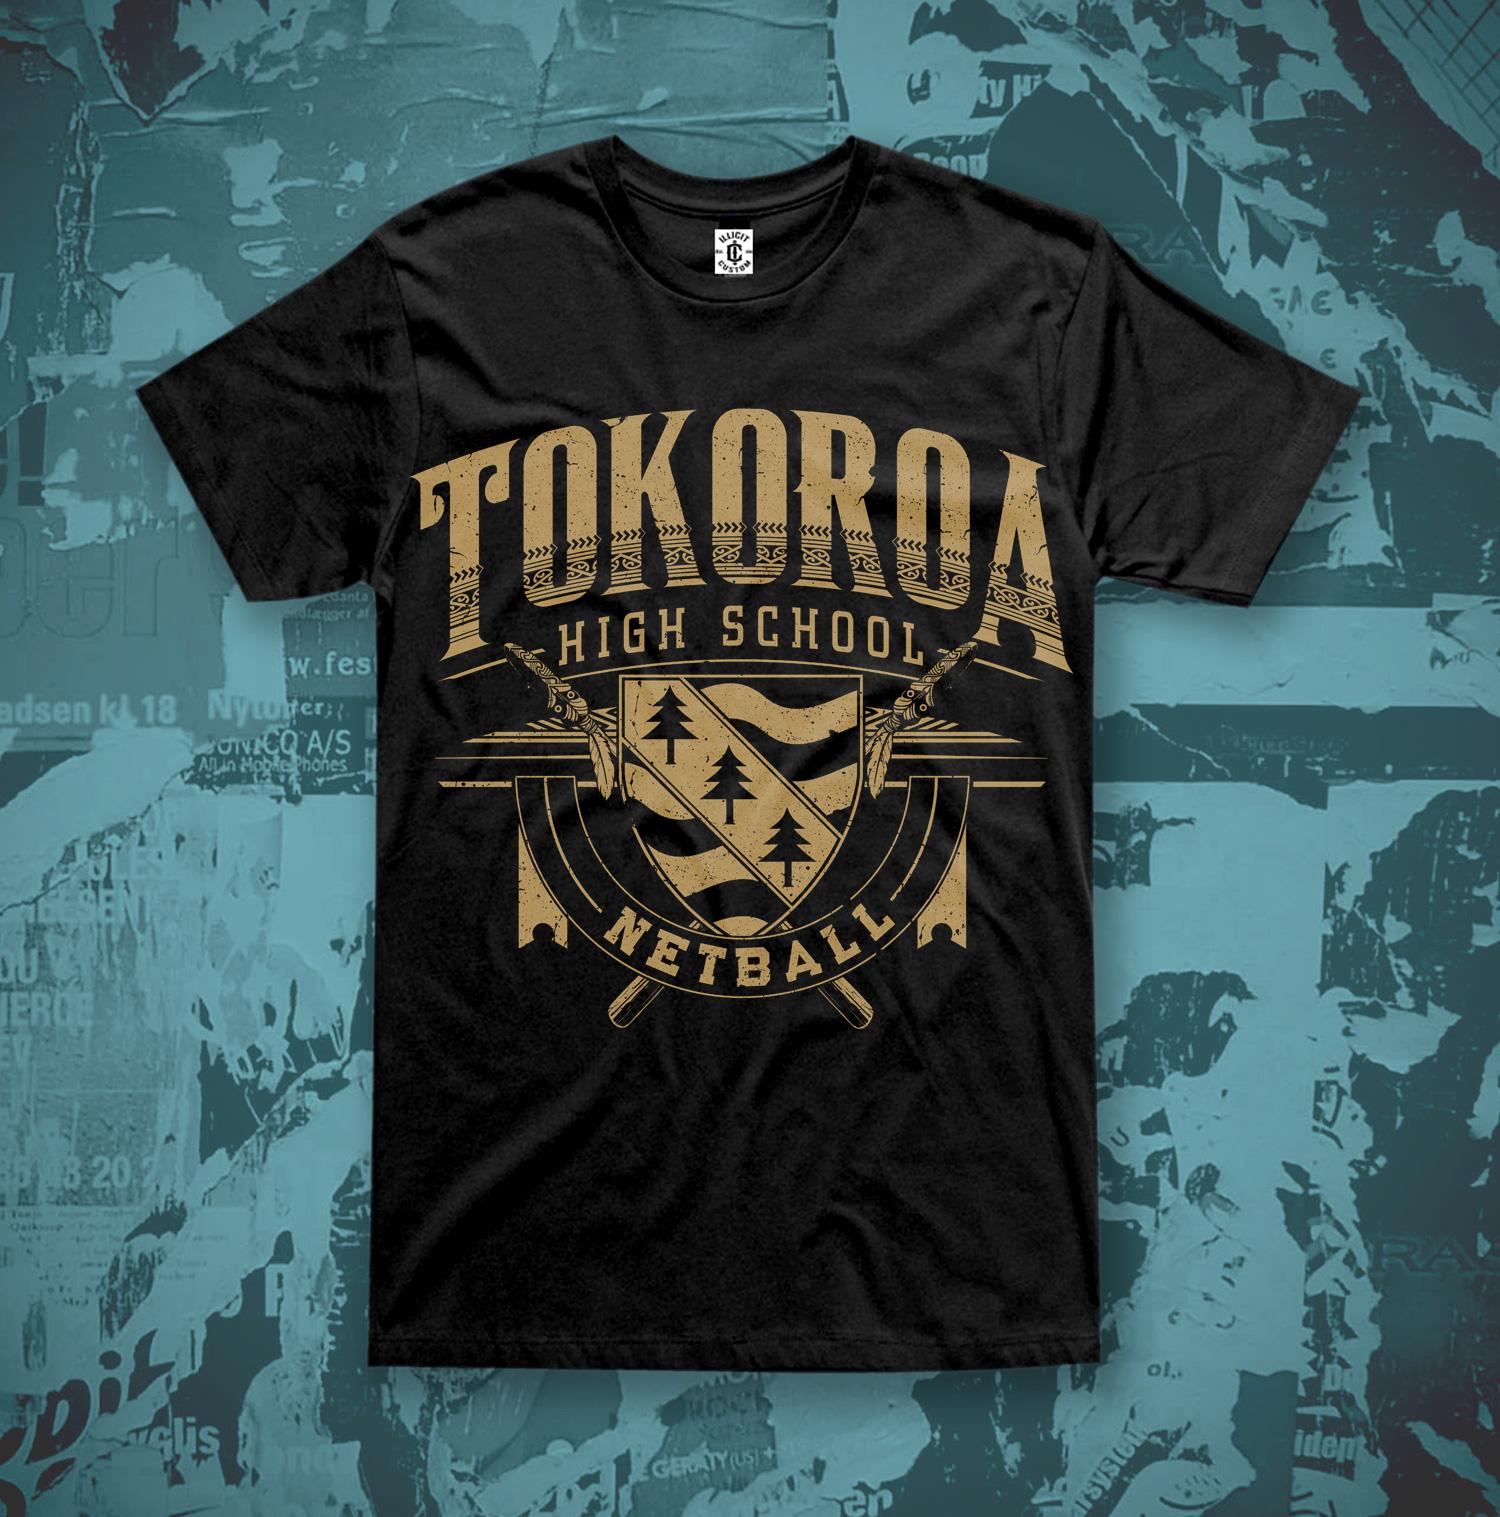 Tokoroa Netball.jpg